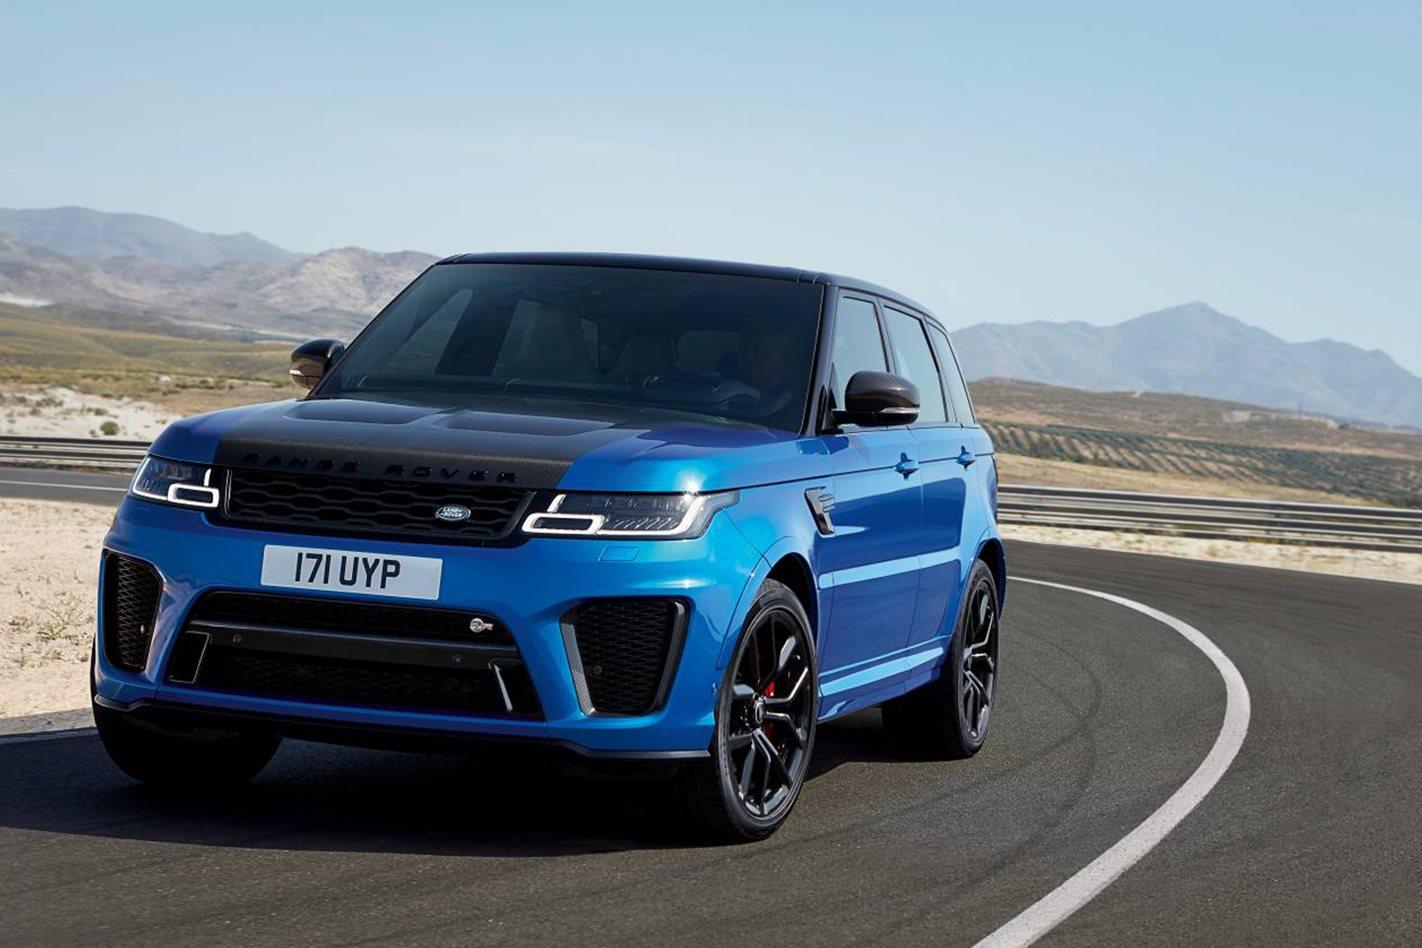 2018-Range-Rover-Sport-drive.jpg